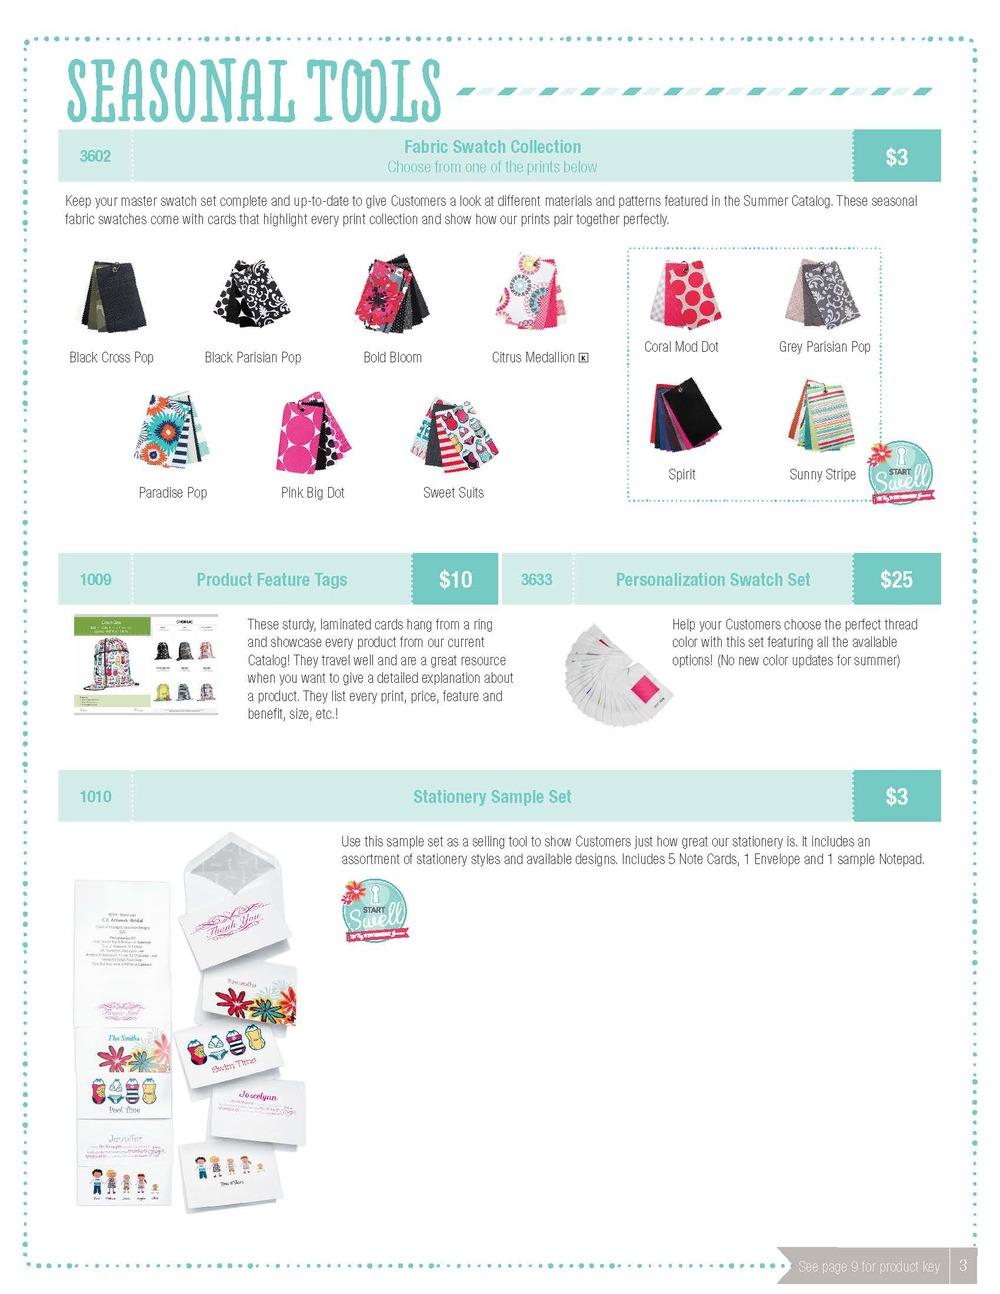 BS_14SU_ShoppingGuide_US_web_Page_3.jpg